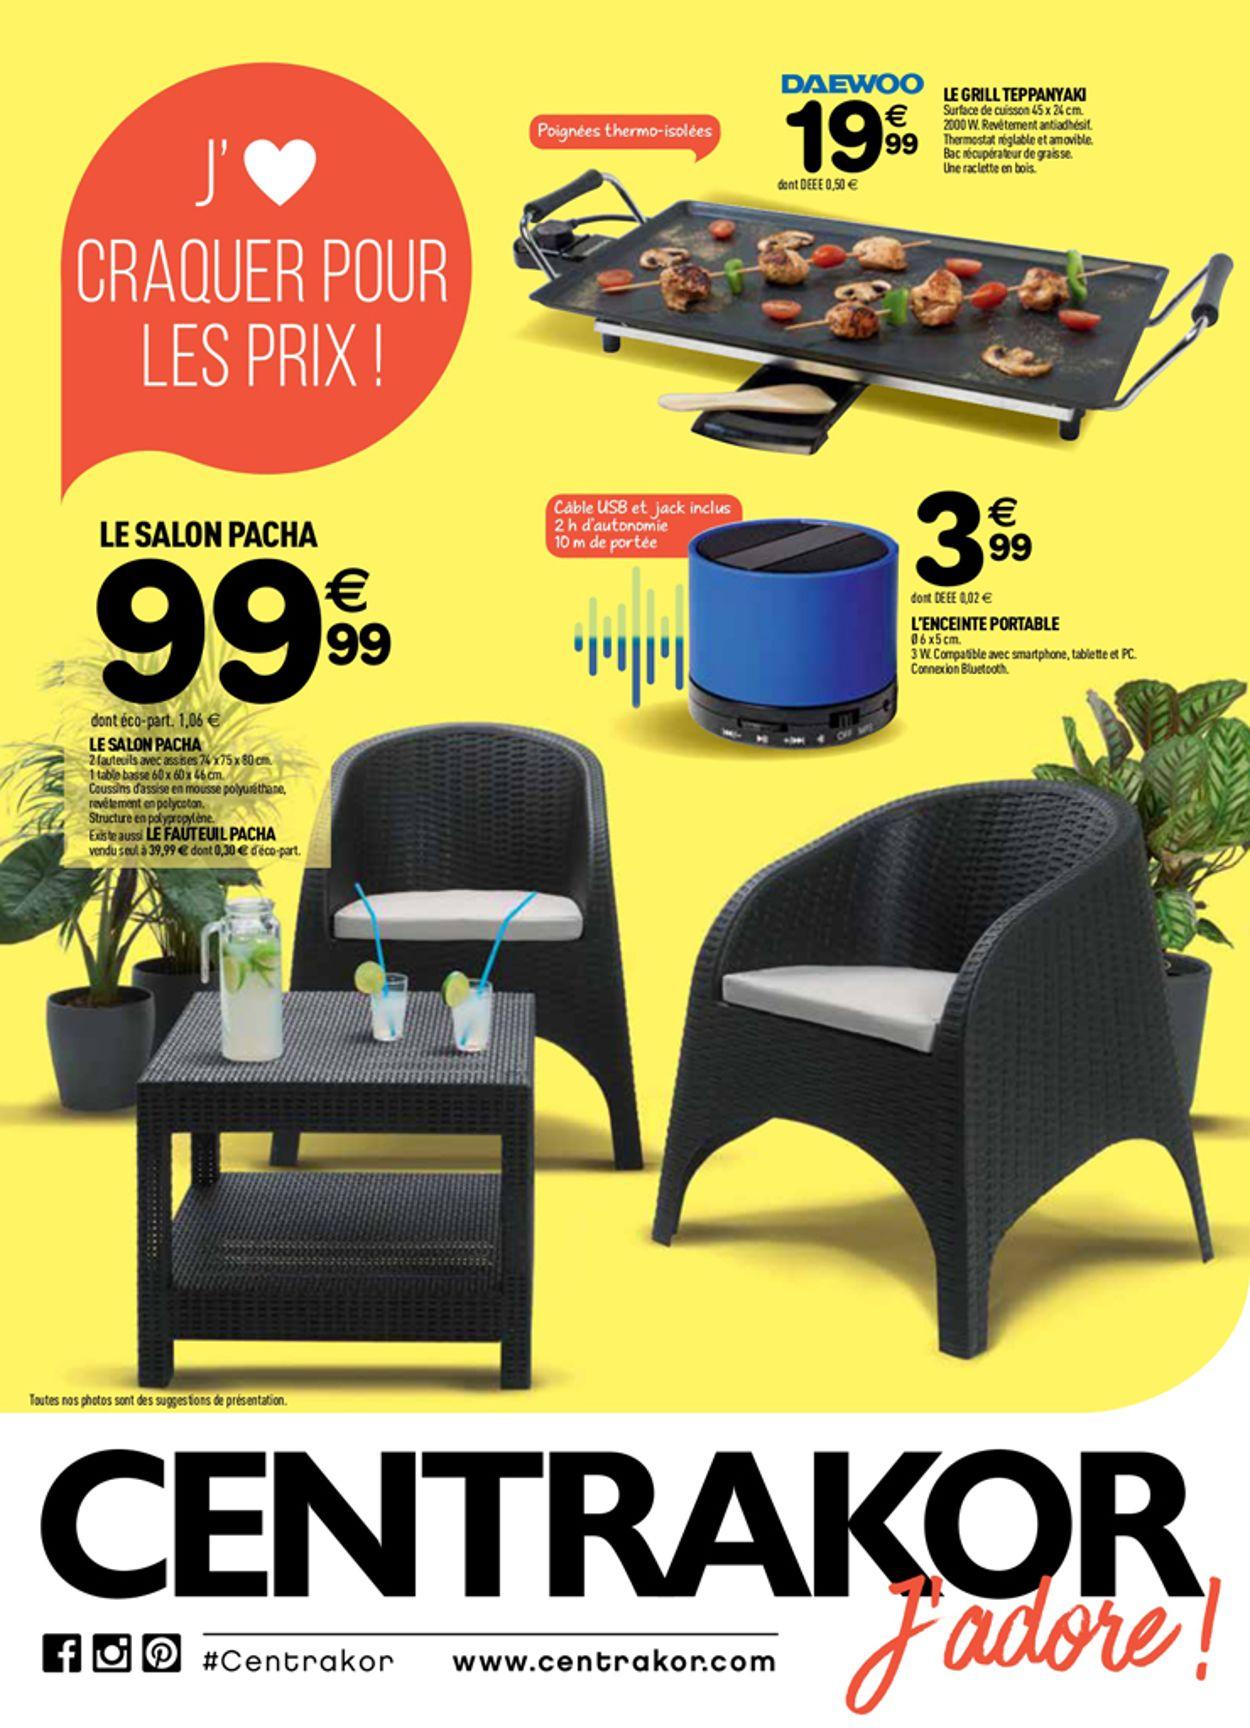 Centrakor Catalogue Actuel 01.07 - 14.07.2019 - Catalogue-24 encequiconcerne Salon De Jardin Centrakor